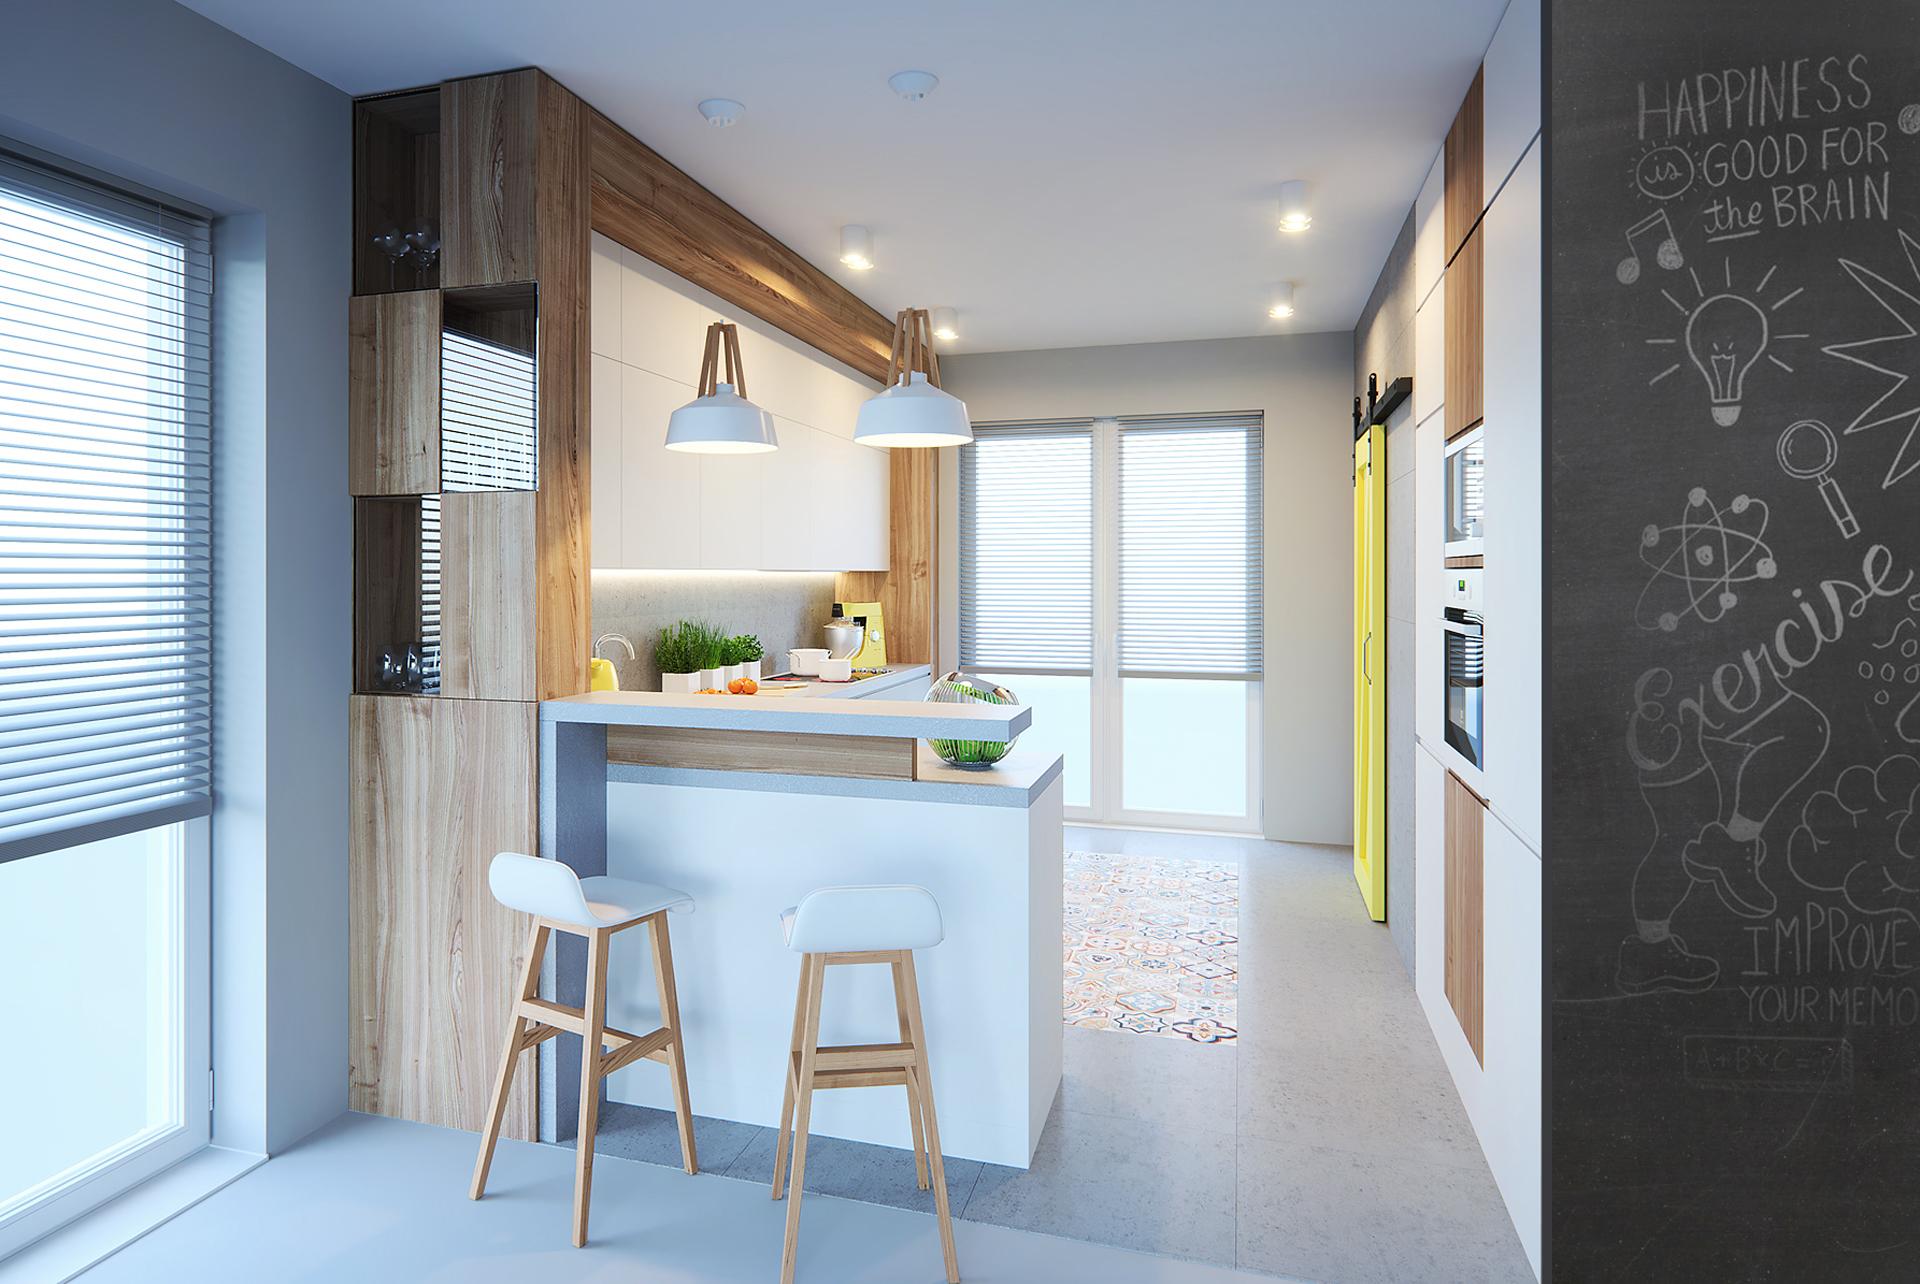 kuchnia drewno beton biel